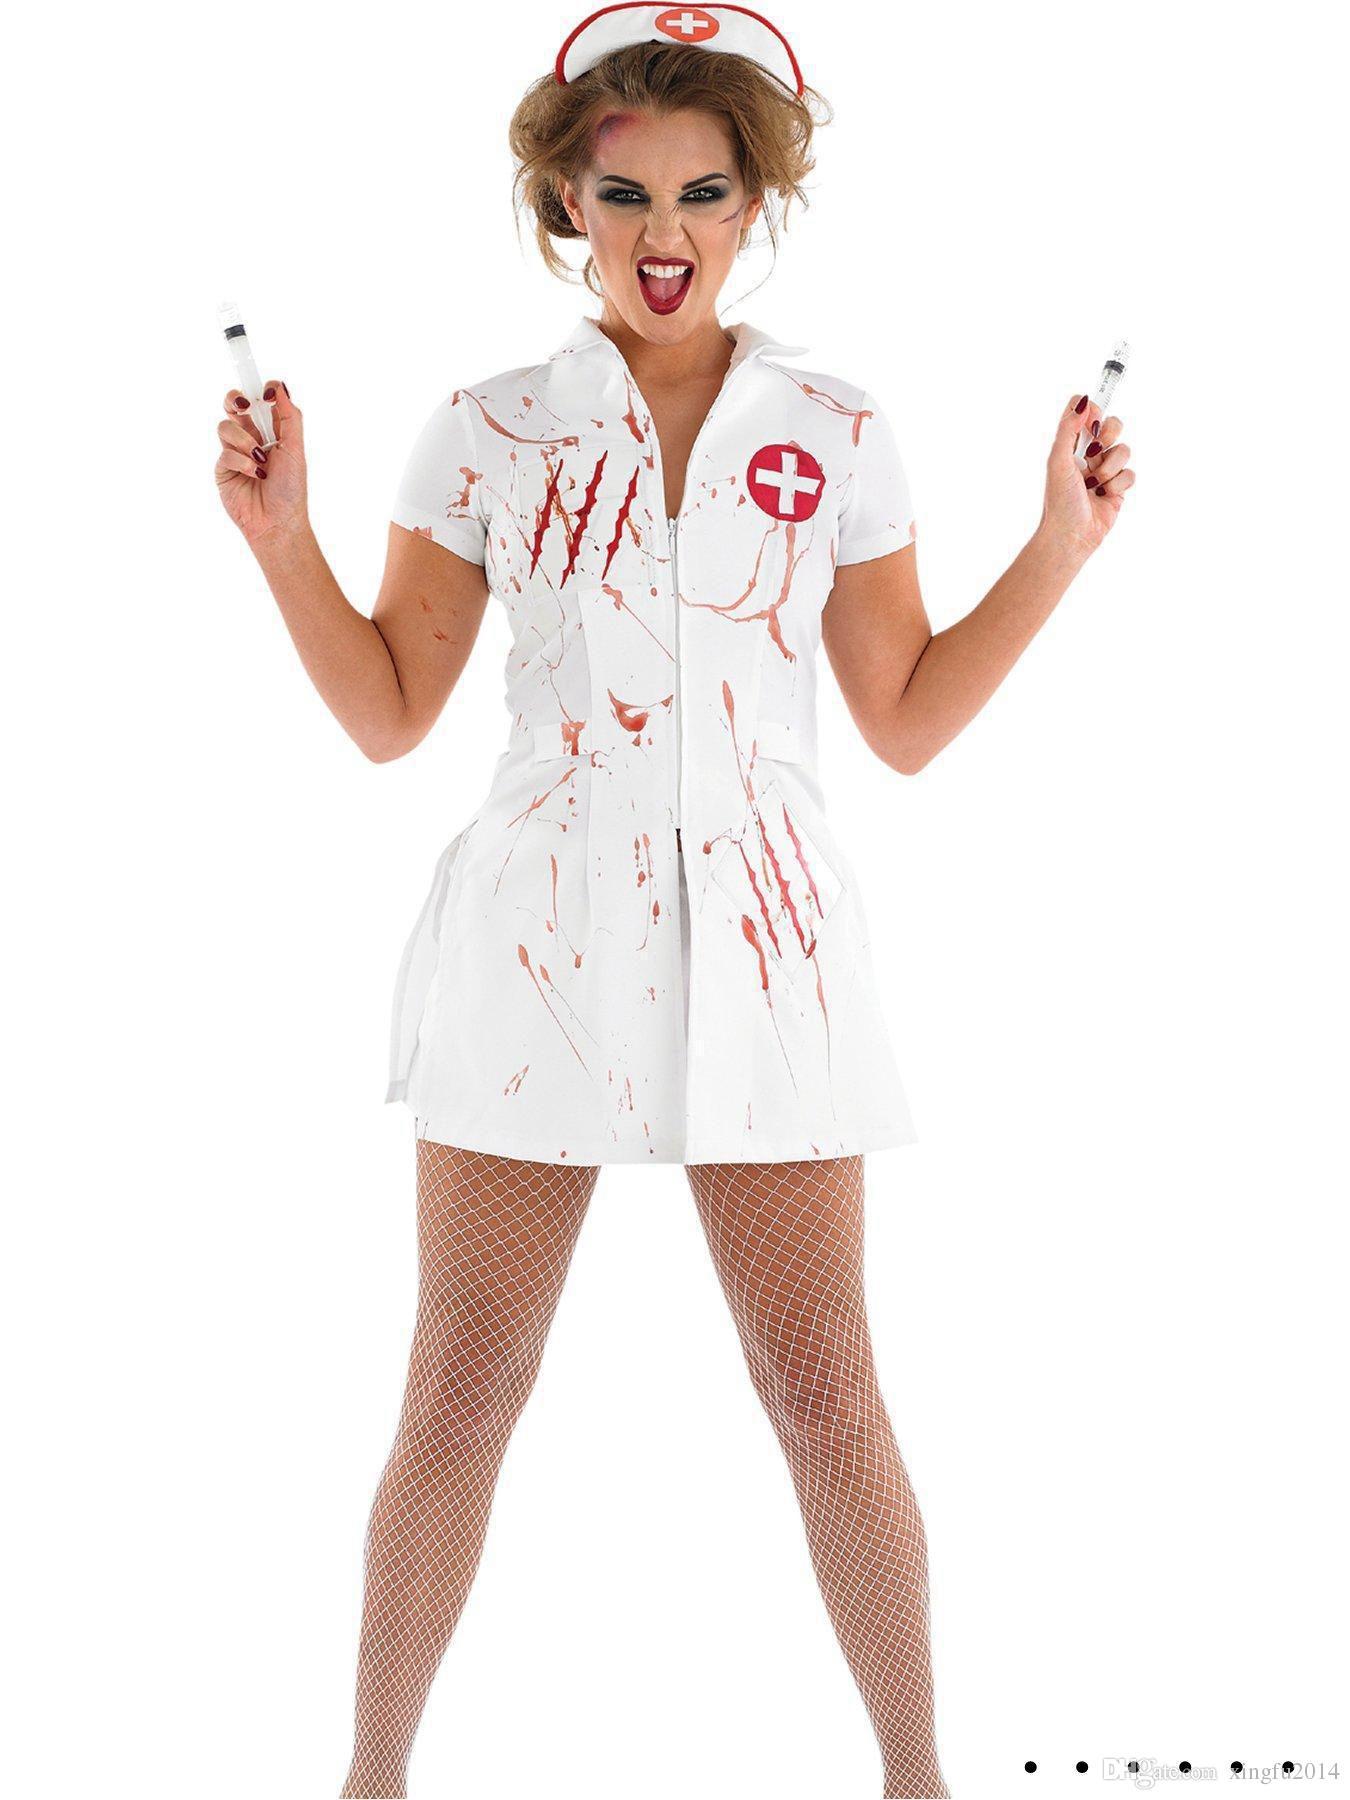 Halloween preteens costume idea